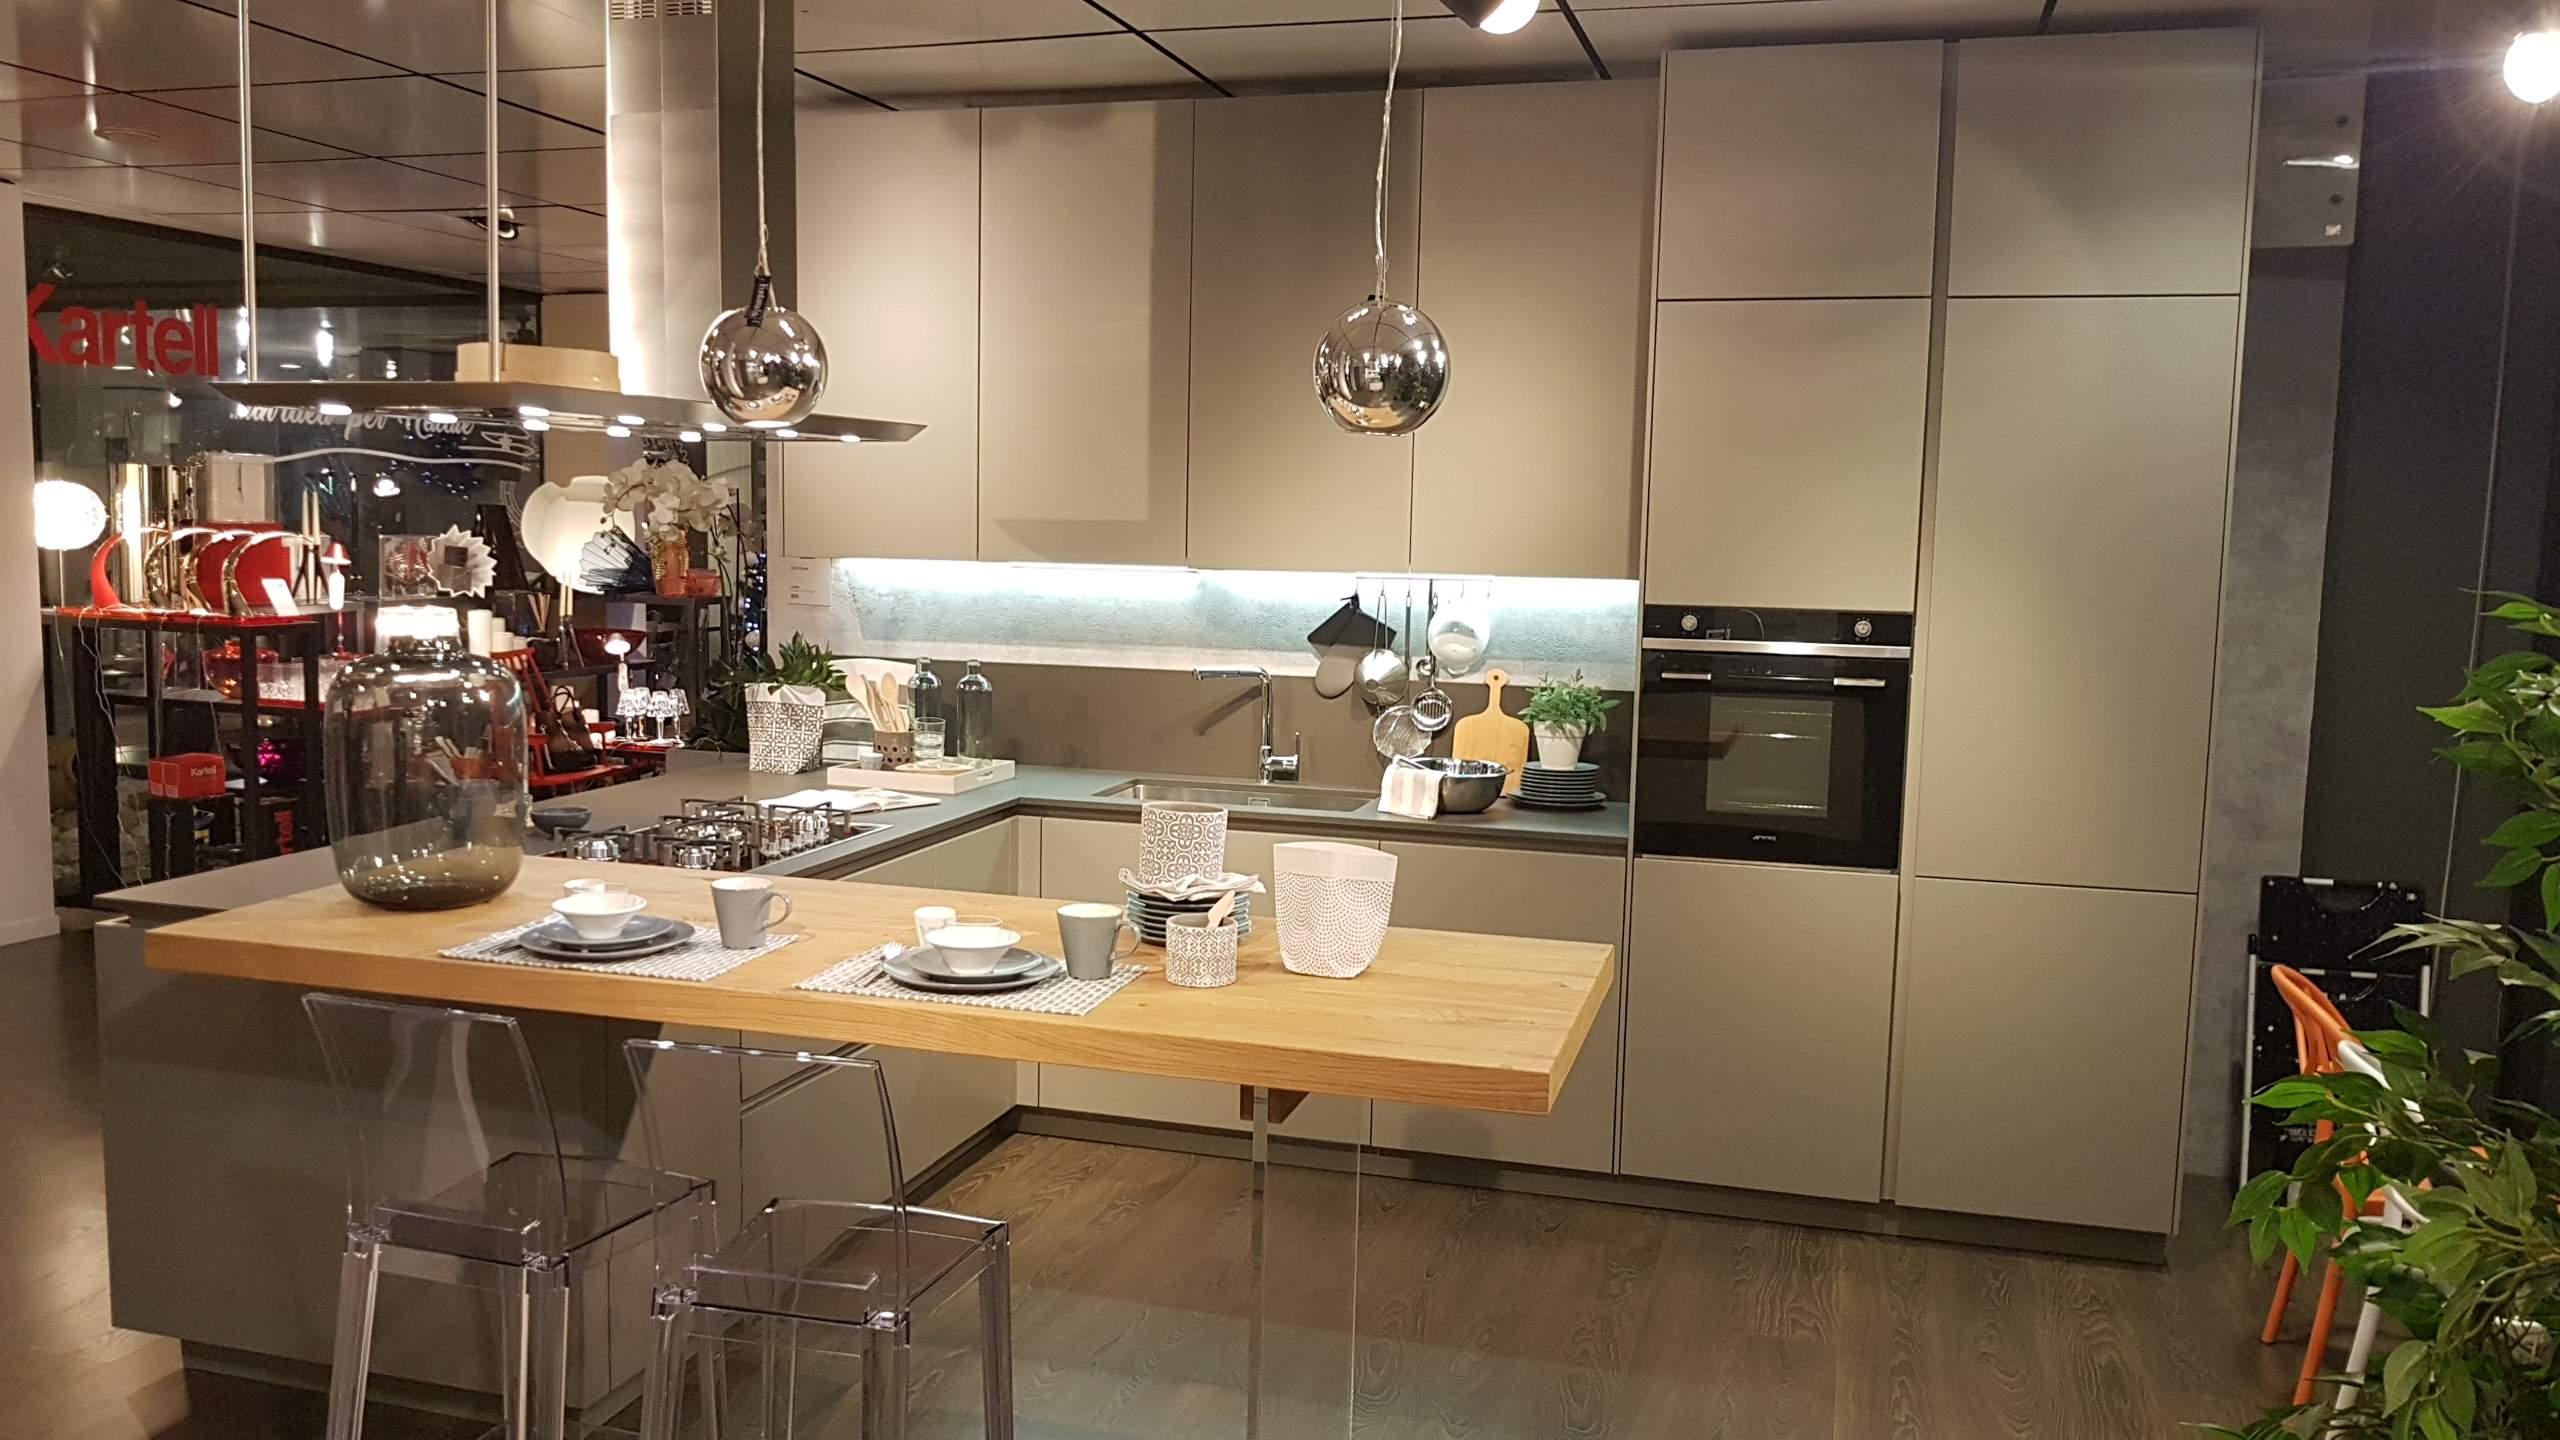 Emejing Prezzo Cucina Snaidero Images - Ideas & Design 2017 ...